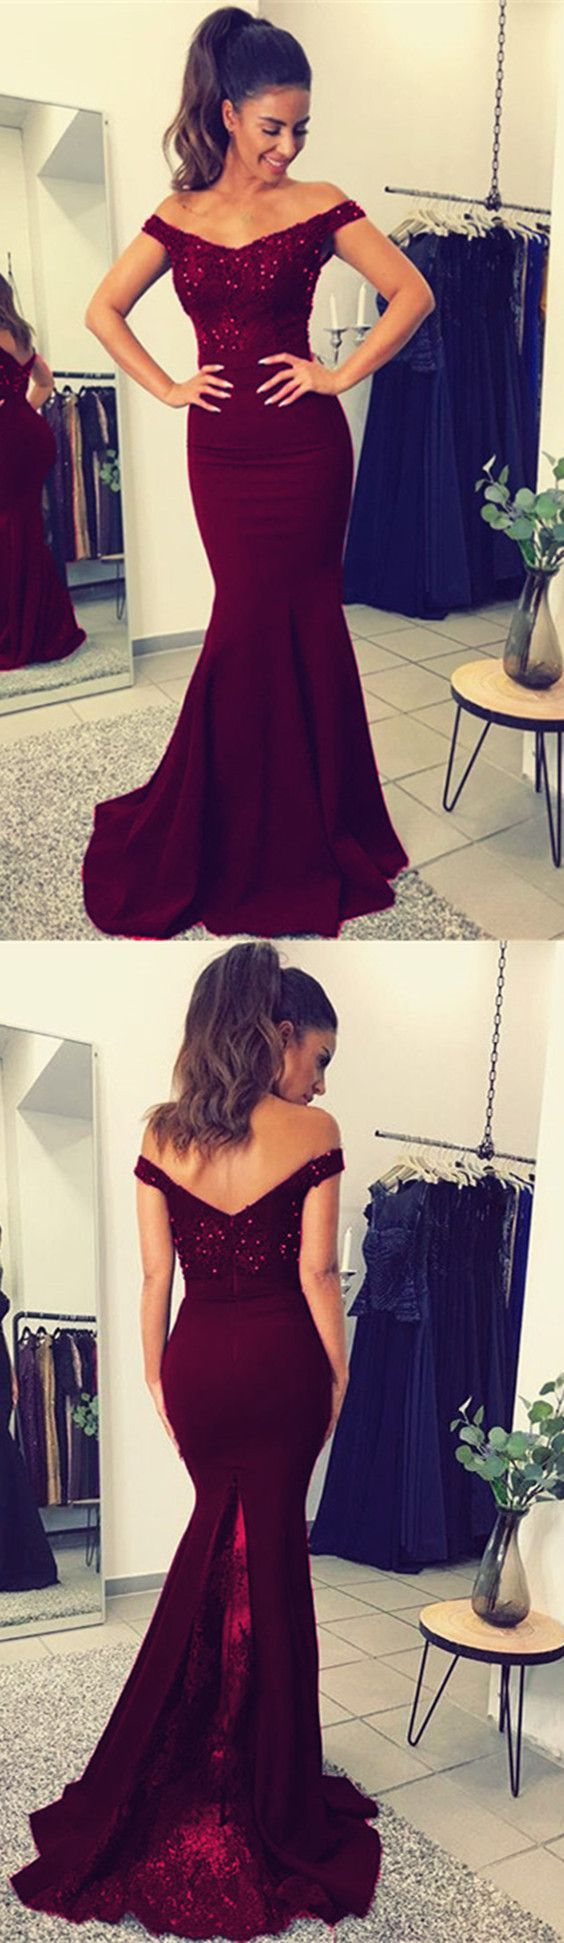 Elegant V-neck Long Mermaid Prom Dresses Lace Beaded Evening Gowns M1056